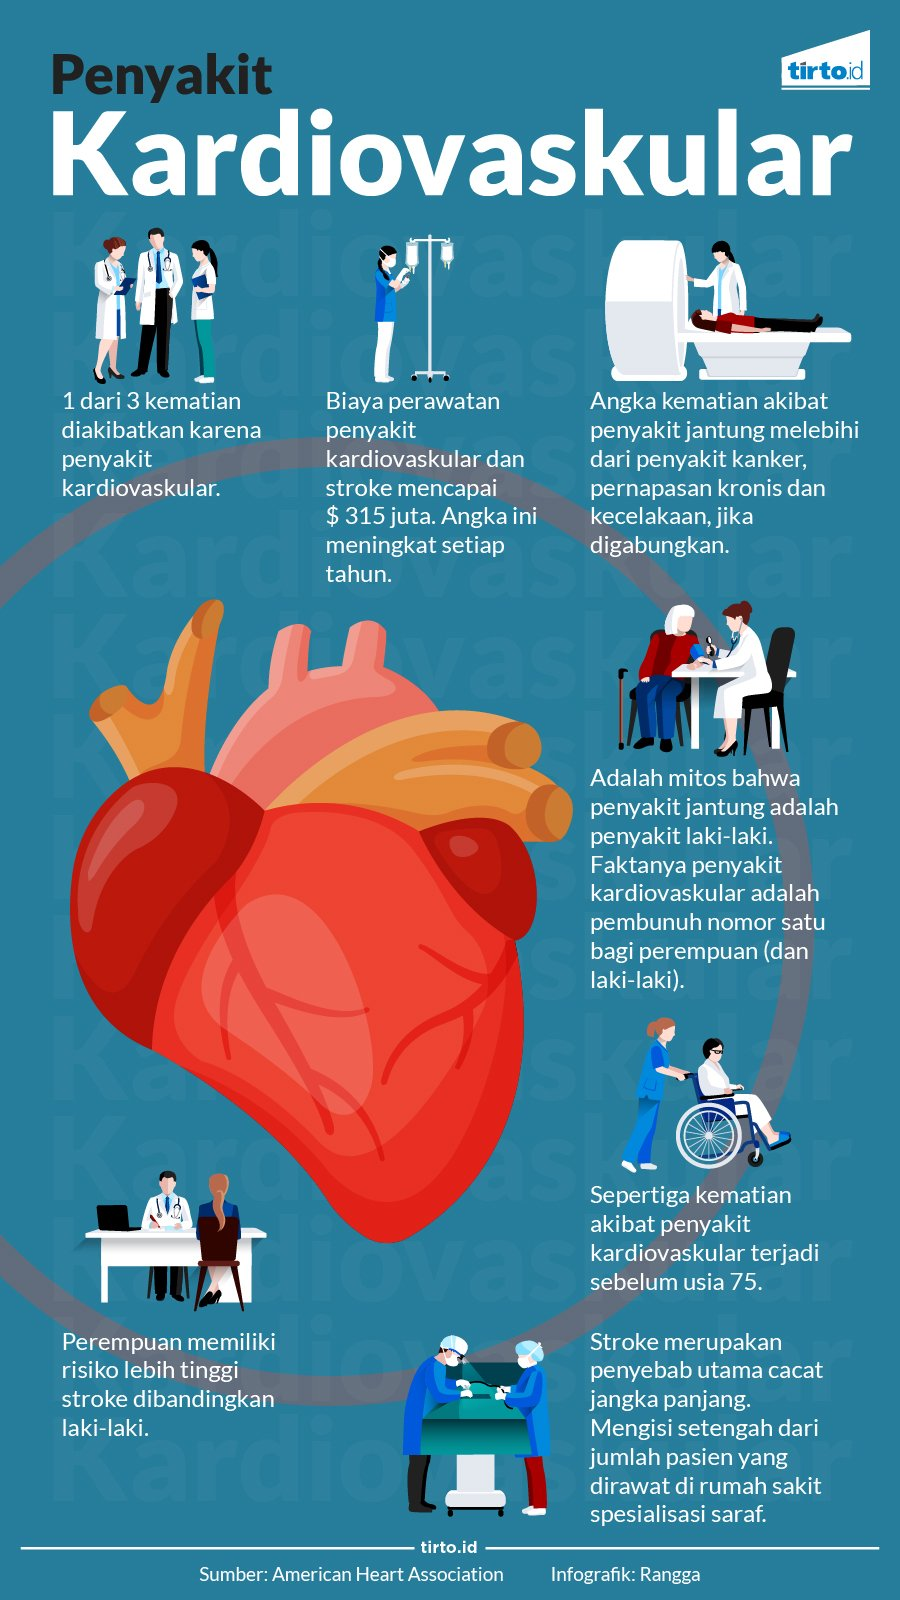 Penyakit Kardiovaskular Pembunuh Nomor Satu Tirto Id